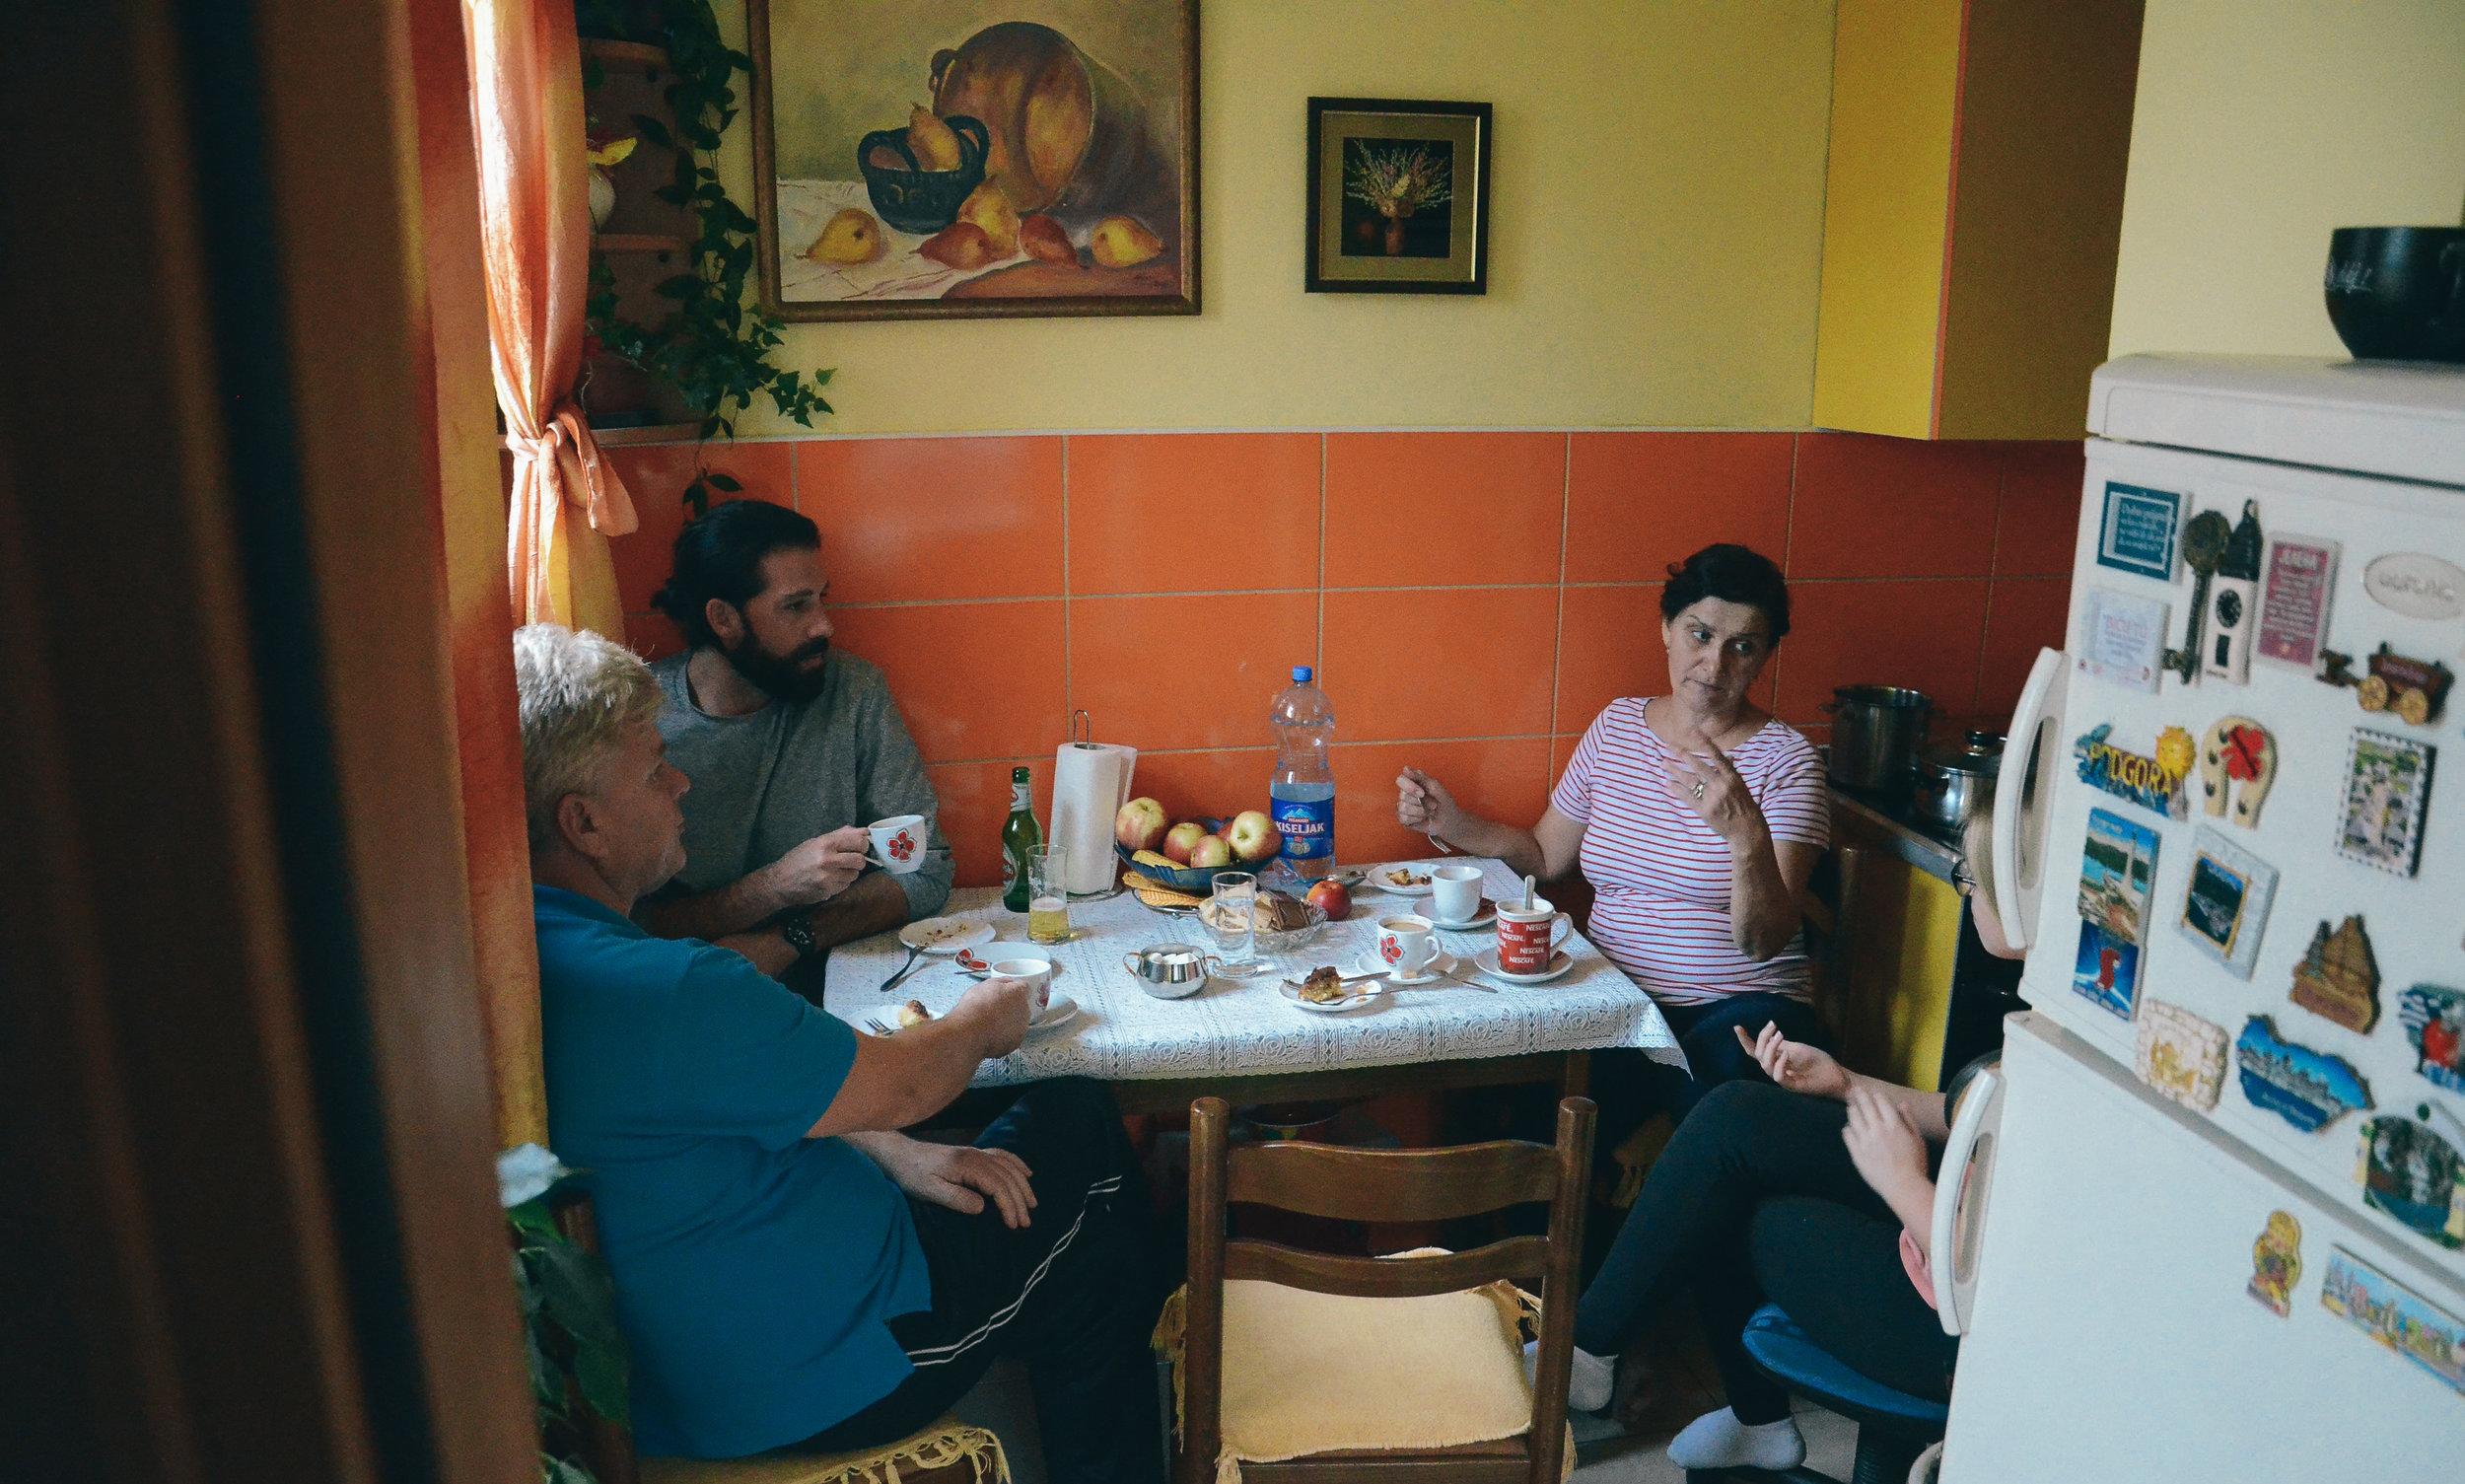 mostar-bosnia-travel-guide-lifeonpine_DSC_3414.jpg